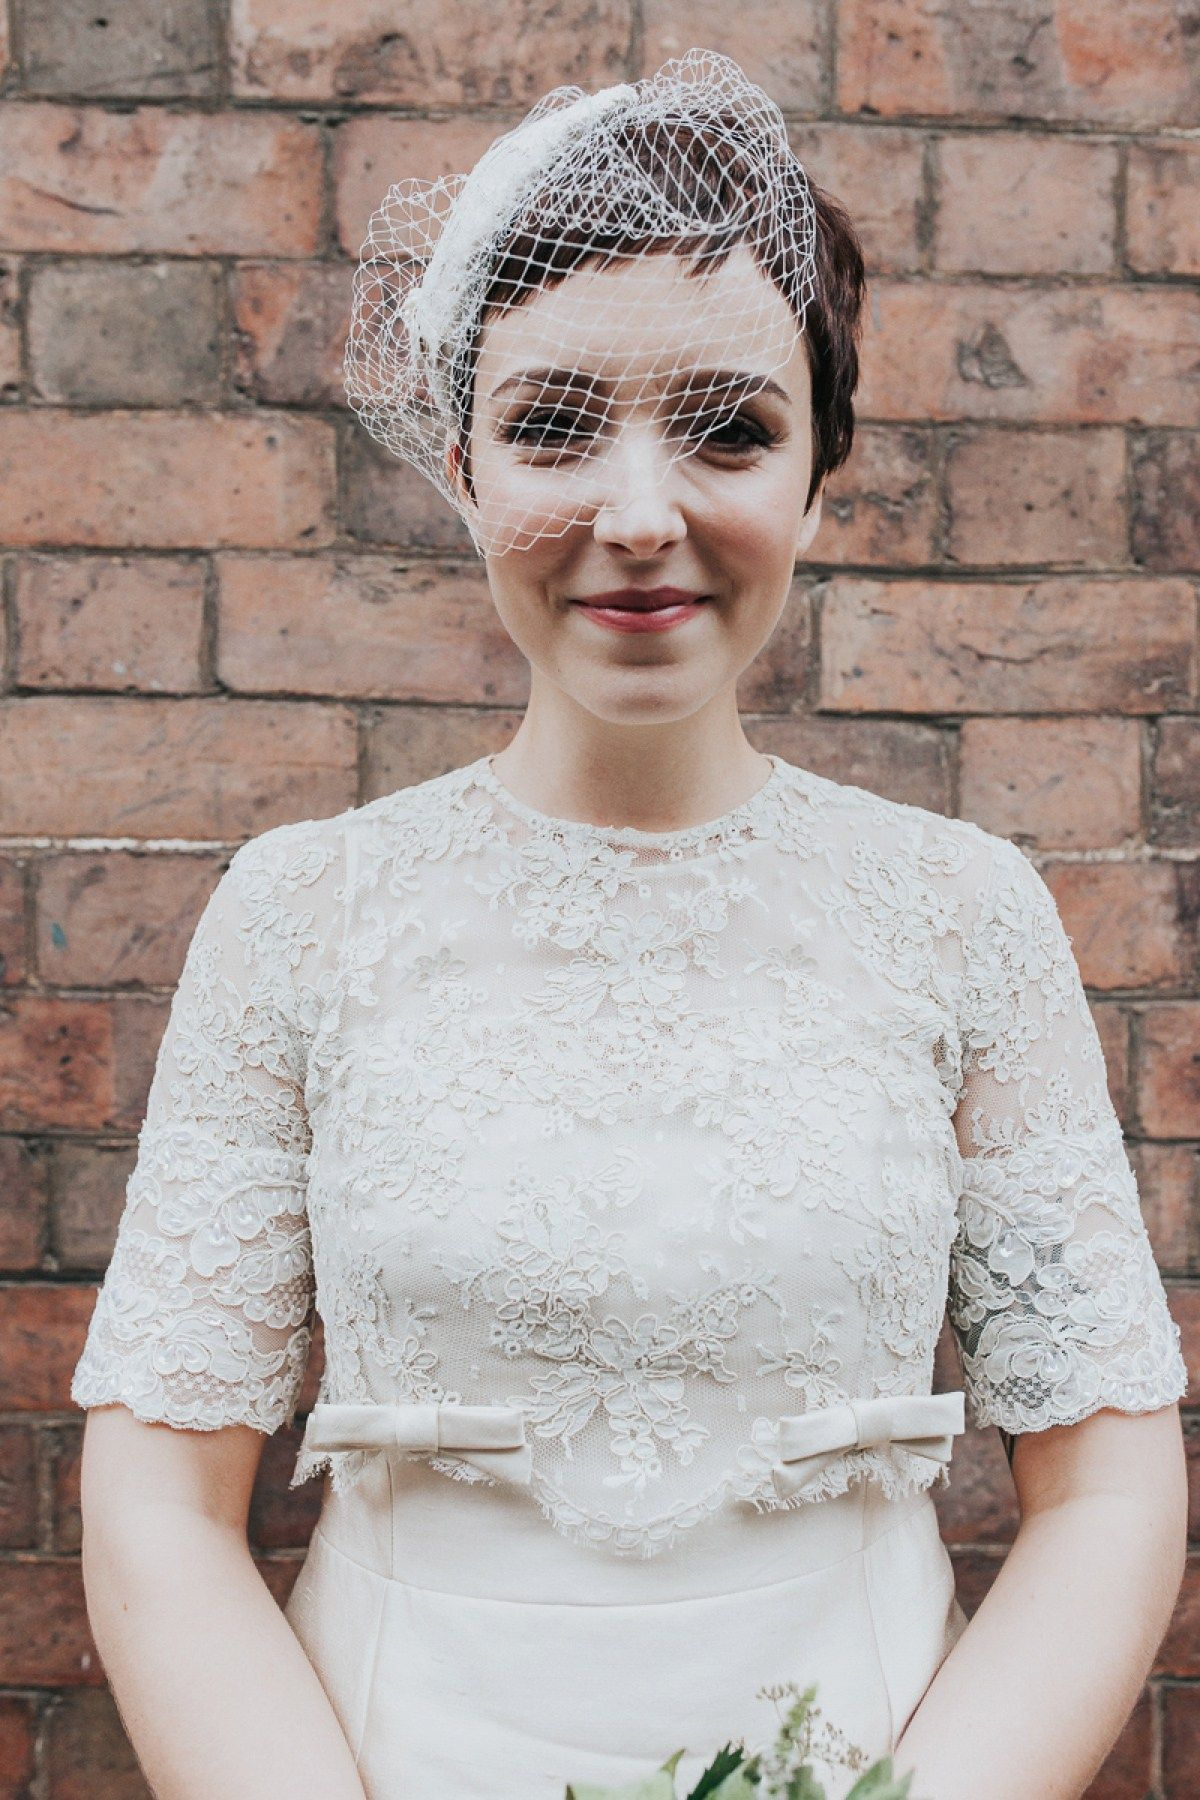 A Short Chic Vintage Dress For A 1960 S Inspired Bride Love My Dress Uk Wedding Blog Wedding Directory Wedding Veils Short Short Wedding Dress 1960 Wedding Dress [ 1800 x 1200 Pixel ]